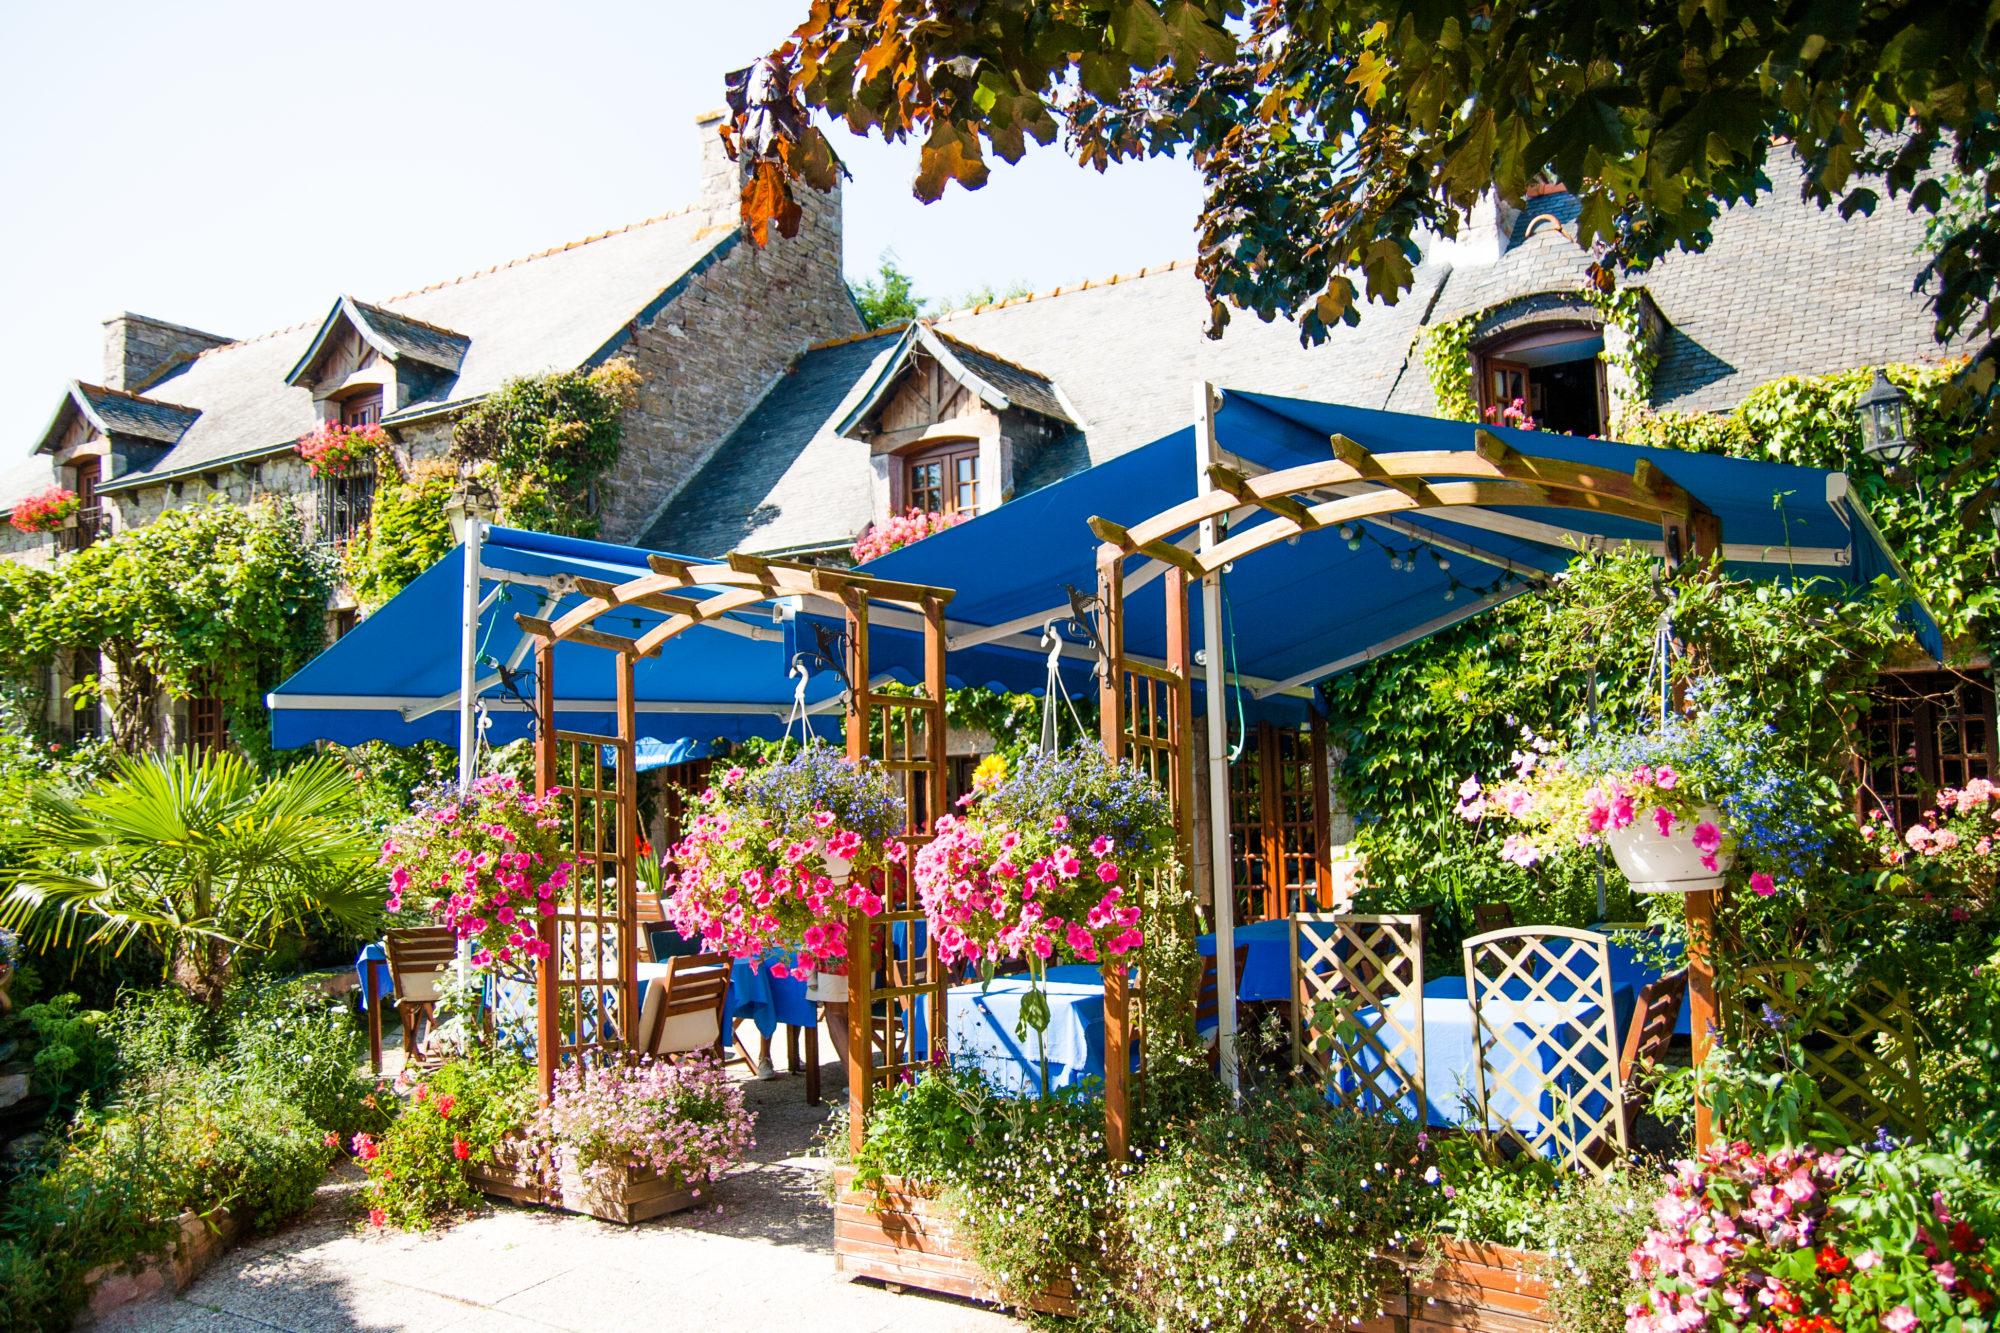 Terrasse du Restaurant Relais Saint-Aubin a Erquy